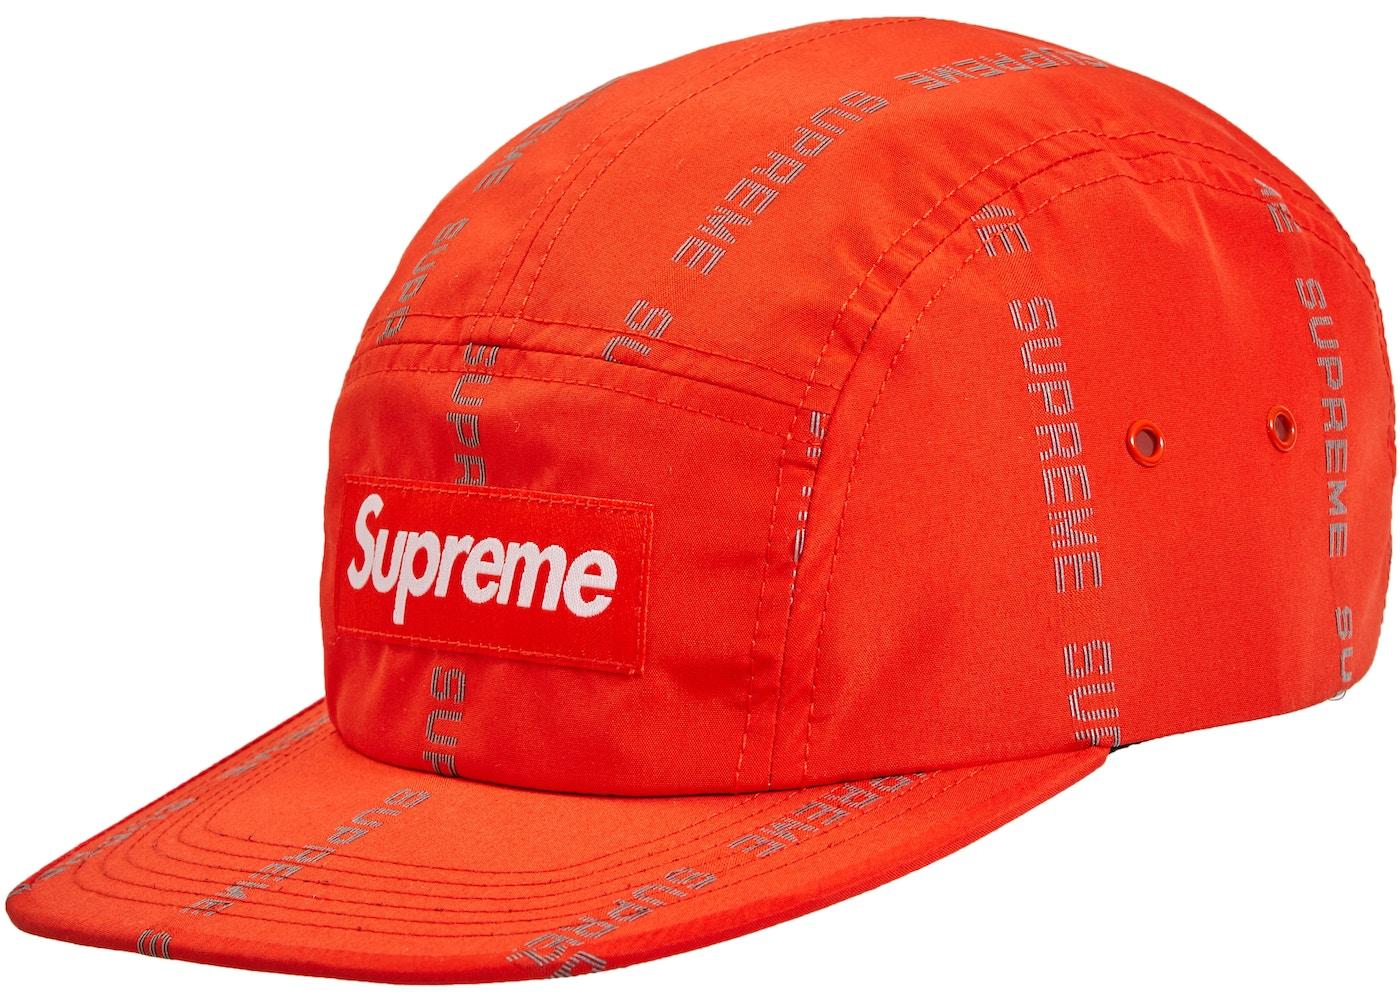 030332ce0d1 HypeAnalyzer · Supreme Reflective Text Camp Cap Orange